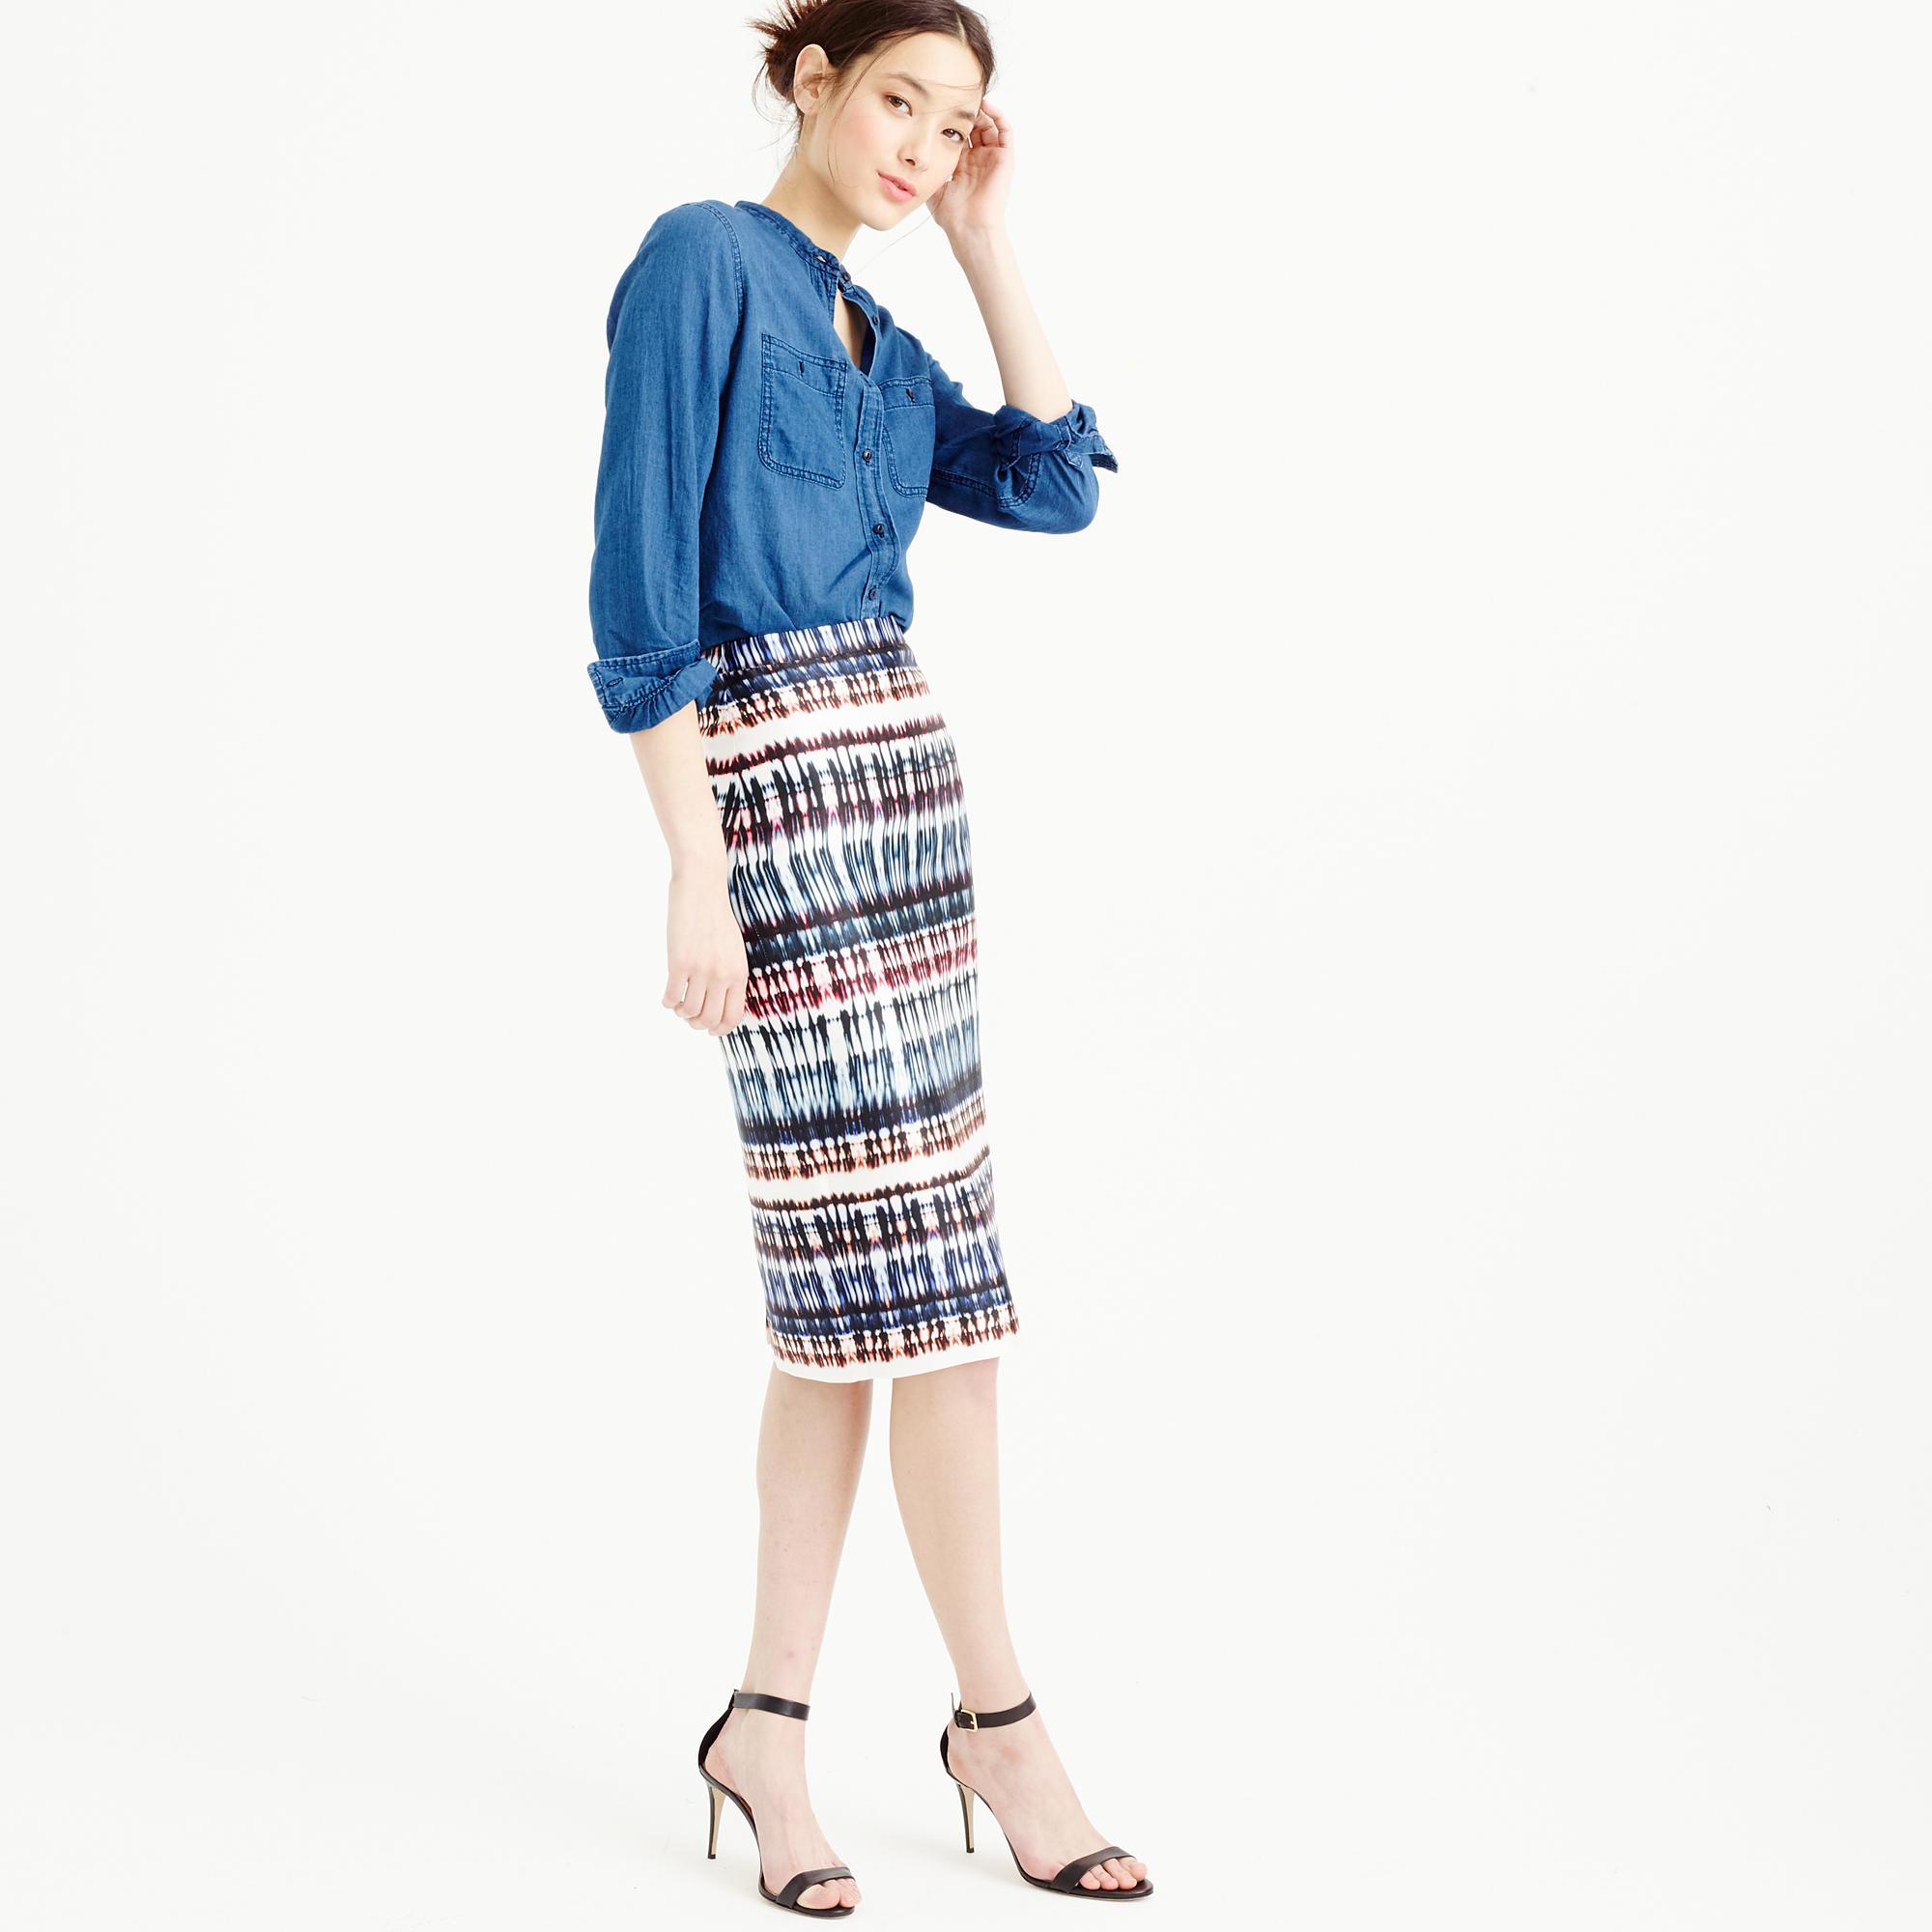 602f2ab3c937 J.Crew Collection Silk Skirt In Tie-dye Print in Blue - Lyst